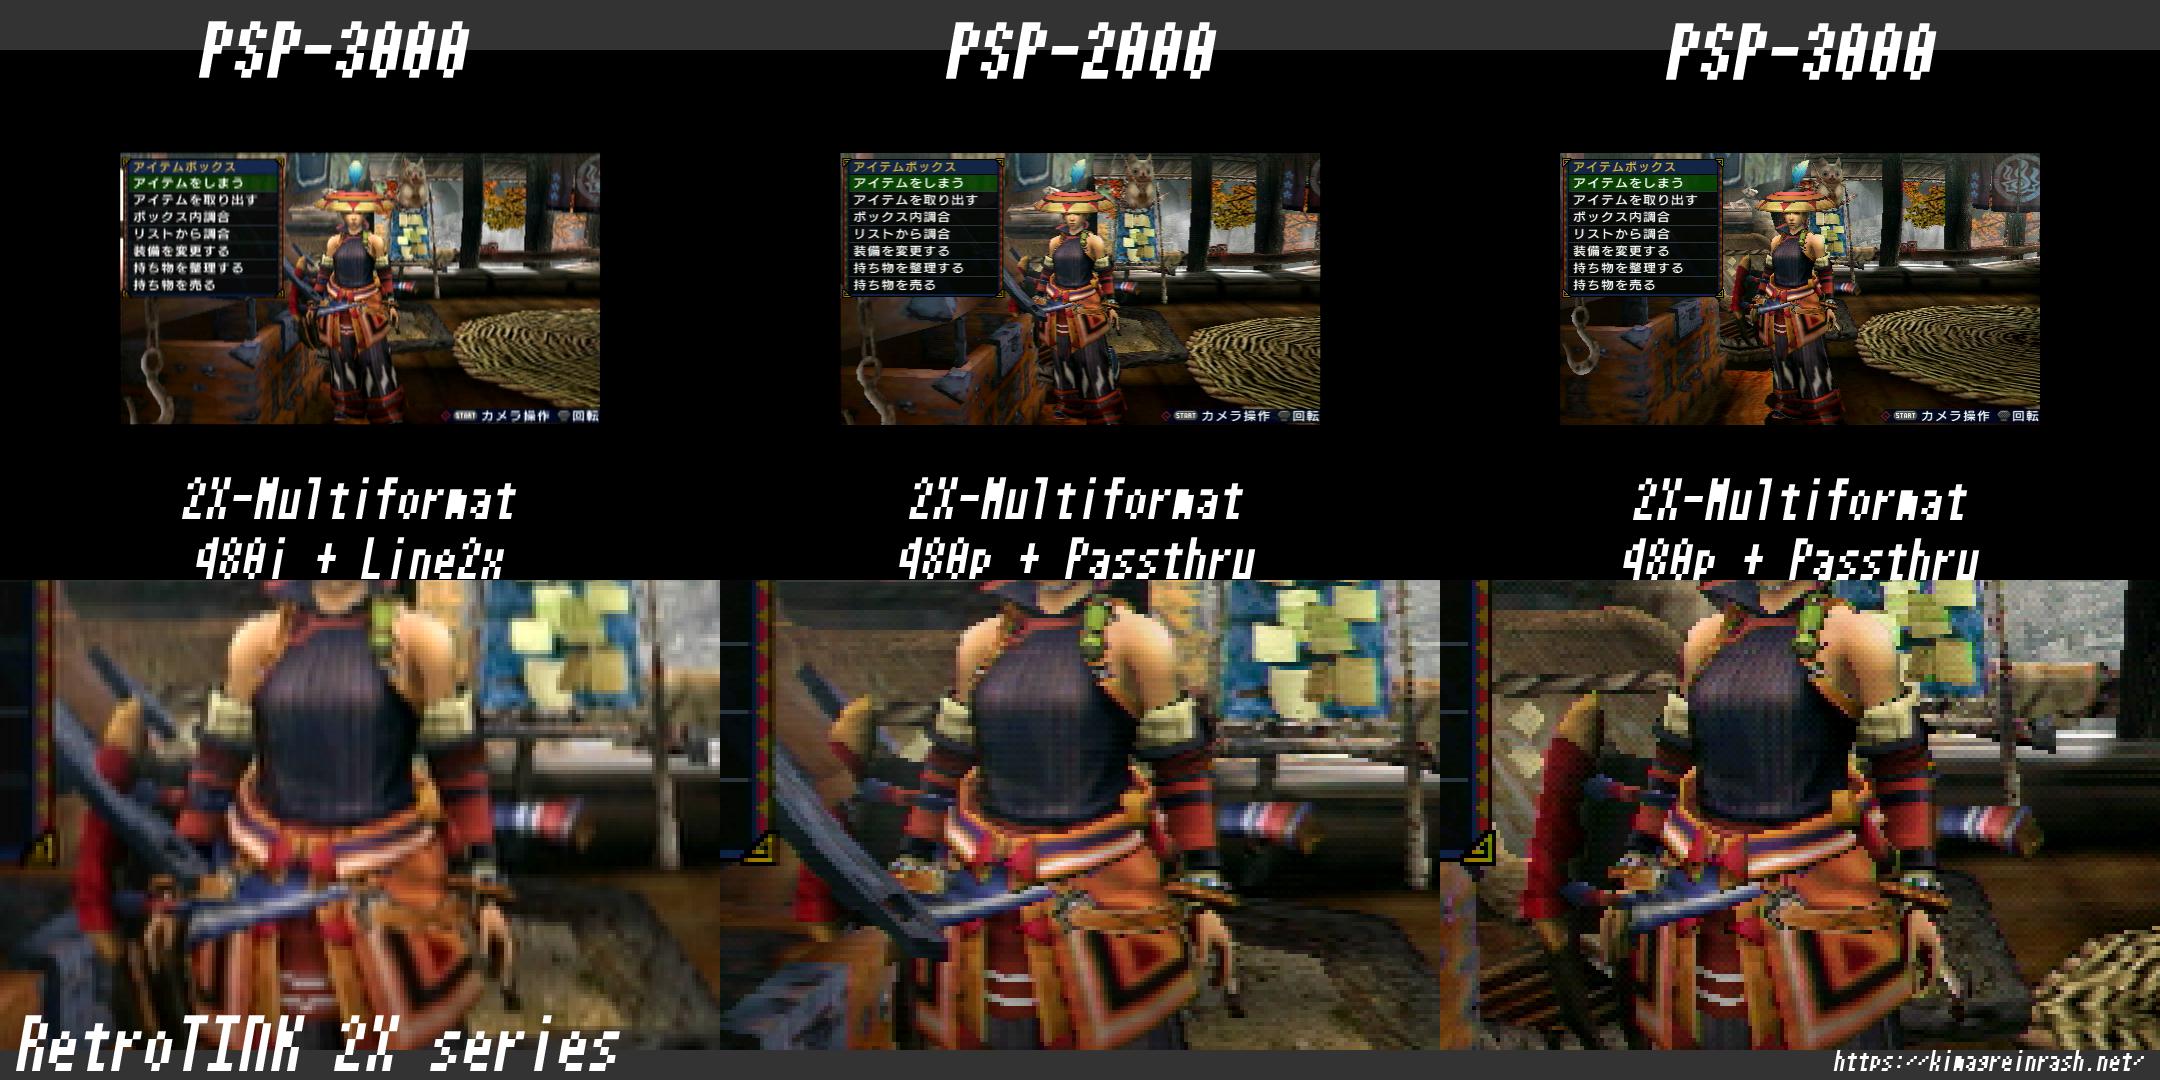 PSPで遊ぶ、キャプチャ・録画方法(自分用メモ)【2020年版】